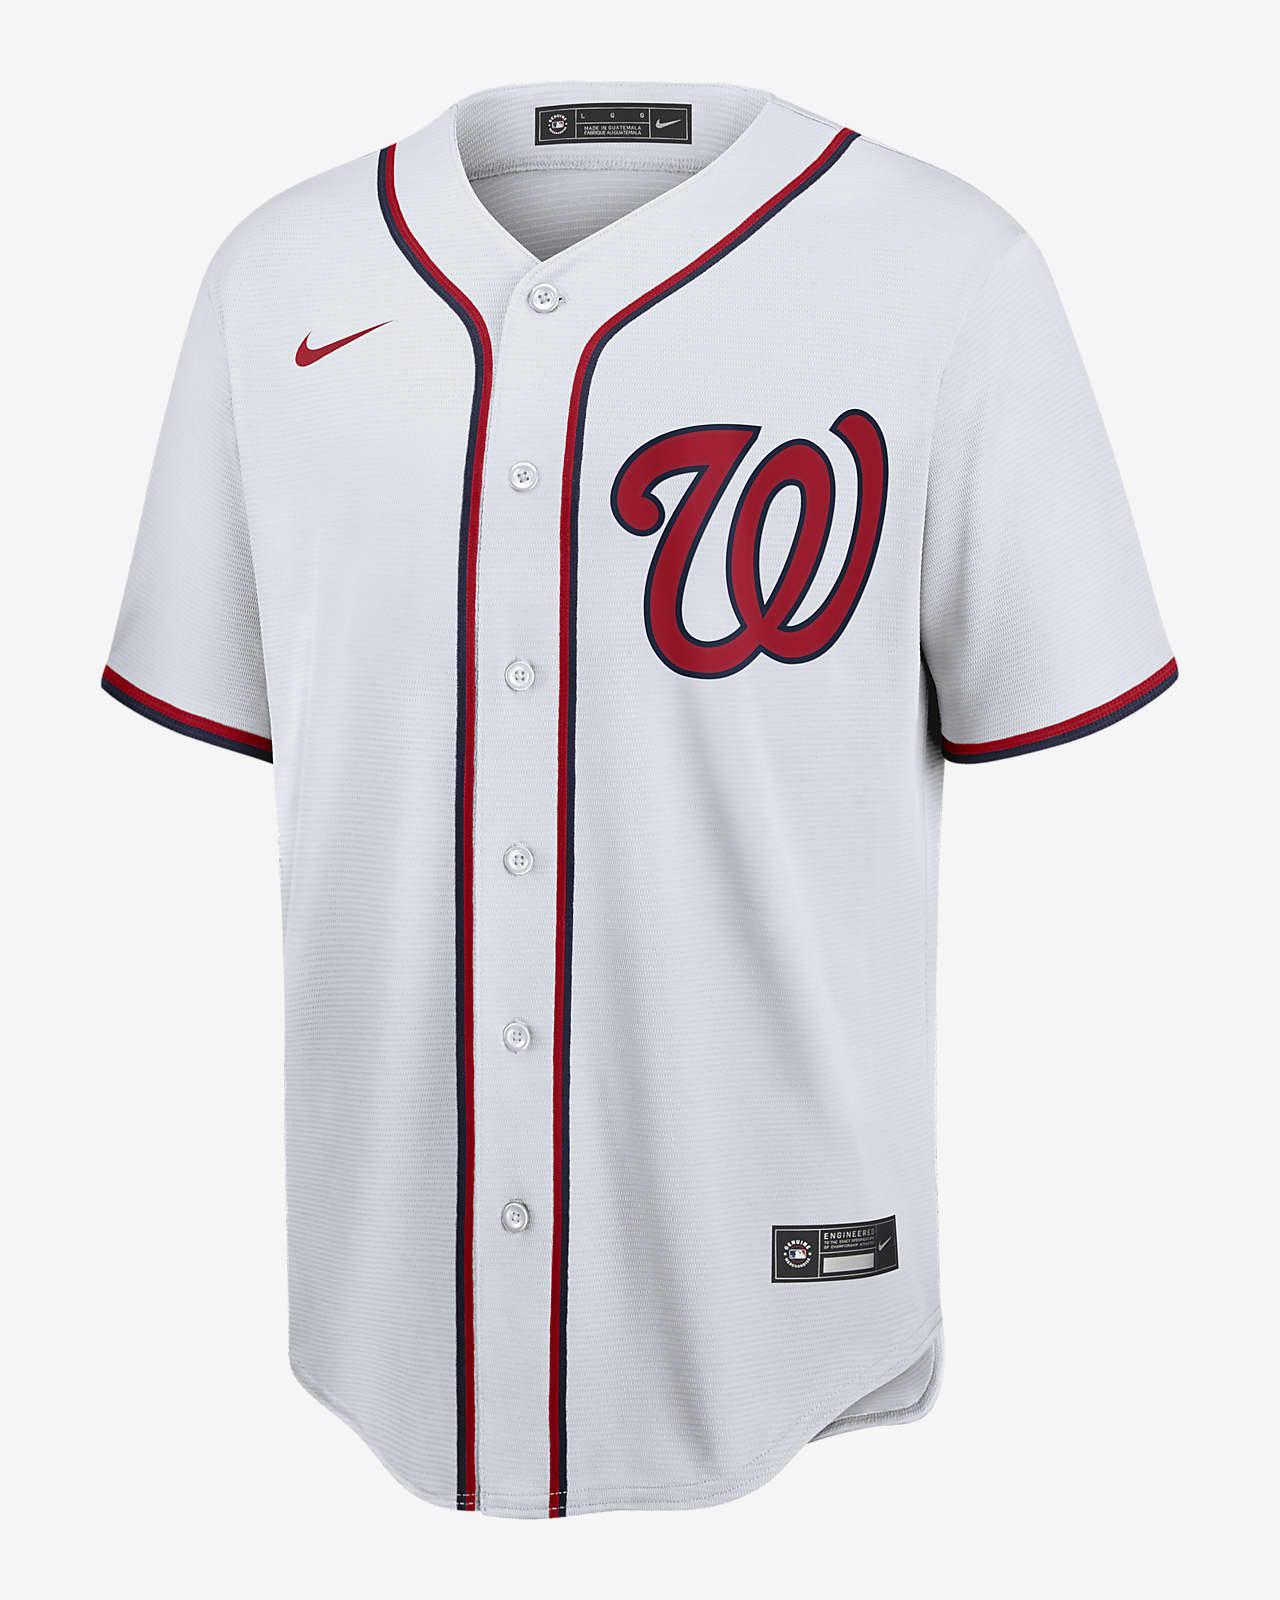 MLB Washington Nationals (Juan Soto) Men's Replica Baseball Jersey